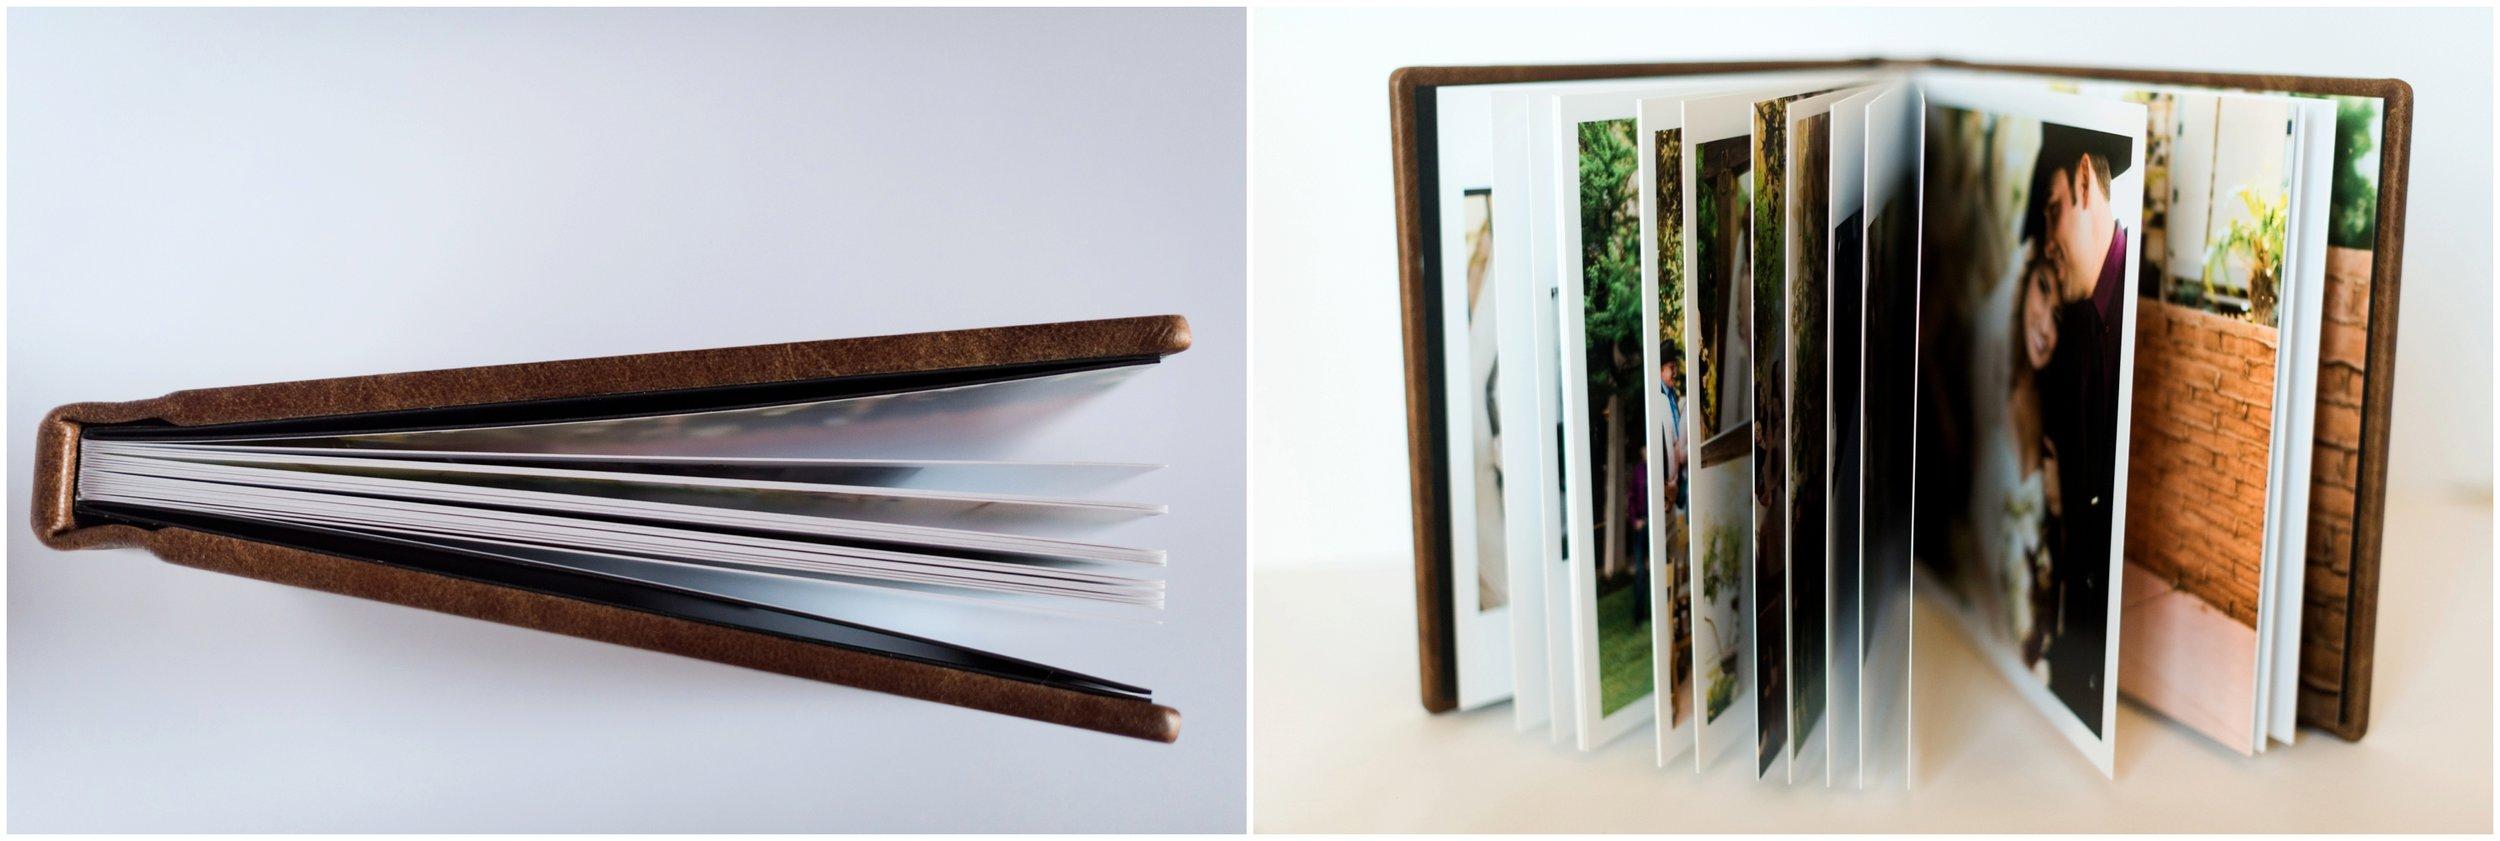 Turning digital photos into prints and professional wedding albums through KISS Books.